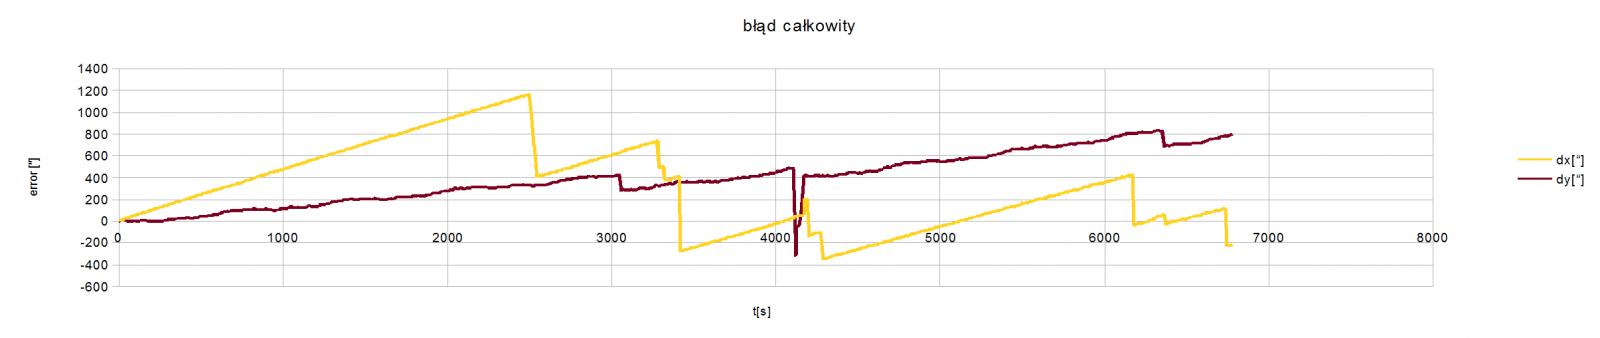 wykres_blad_calkowity_30kwietnia_no_compensation.png